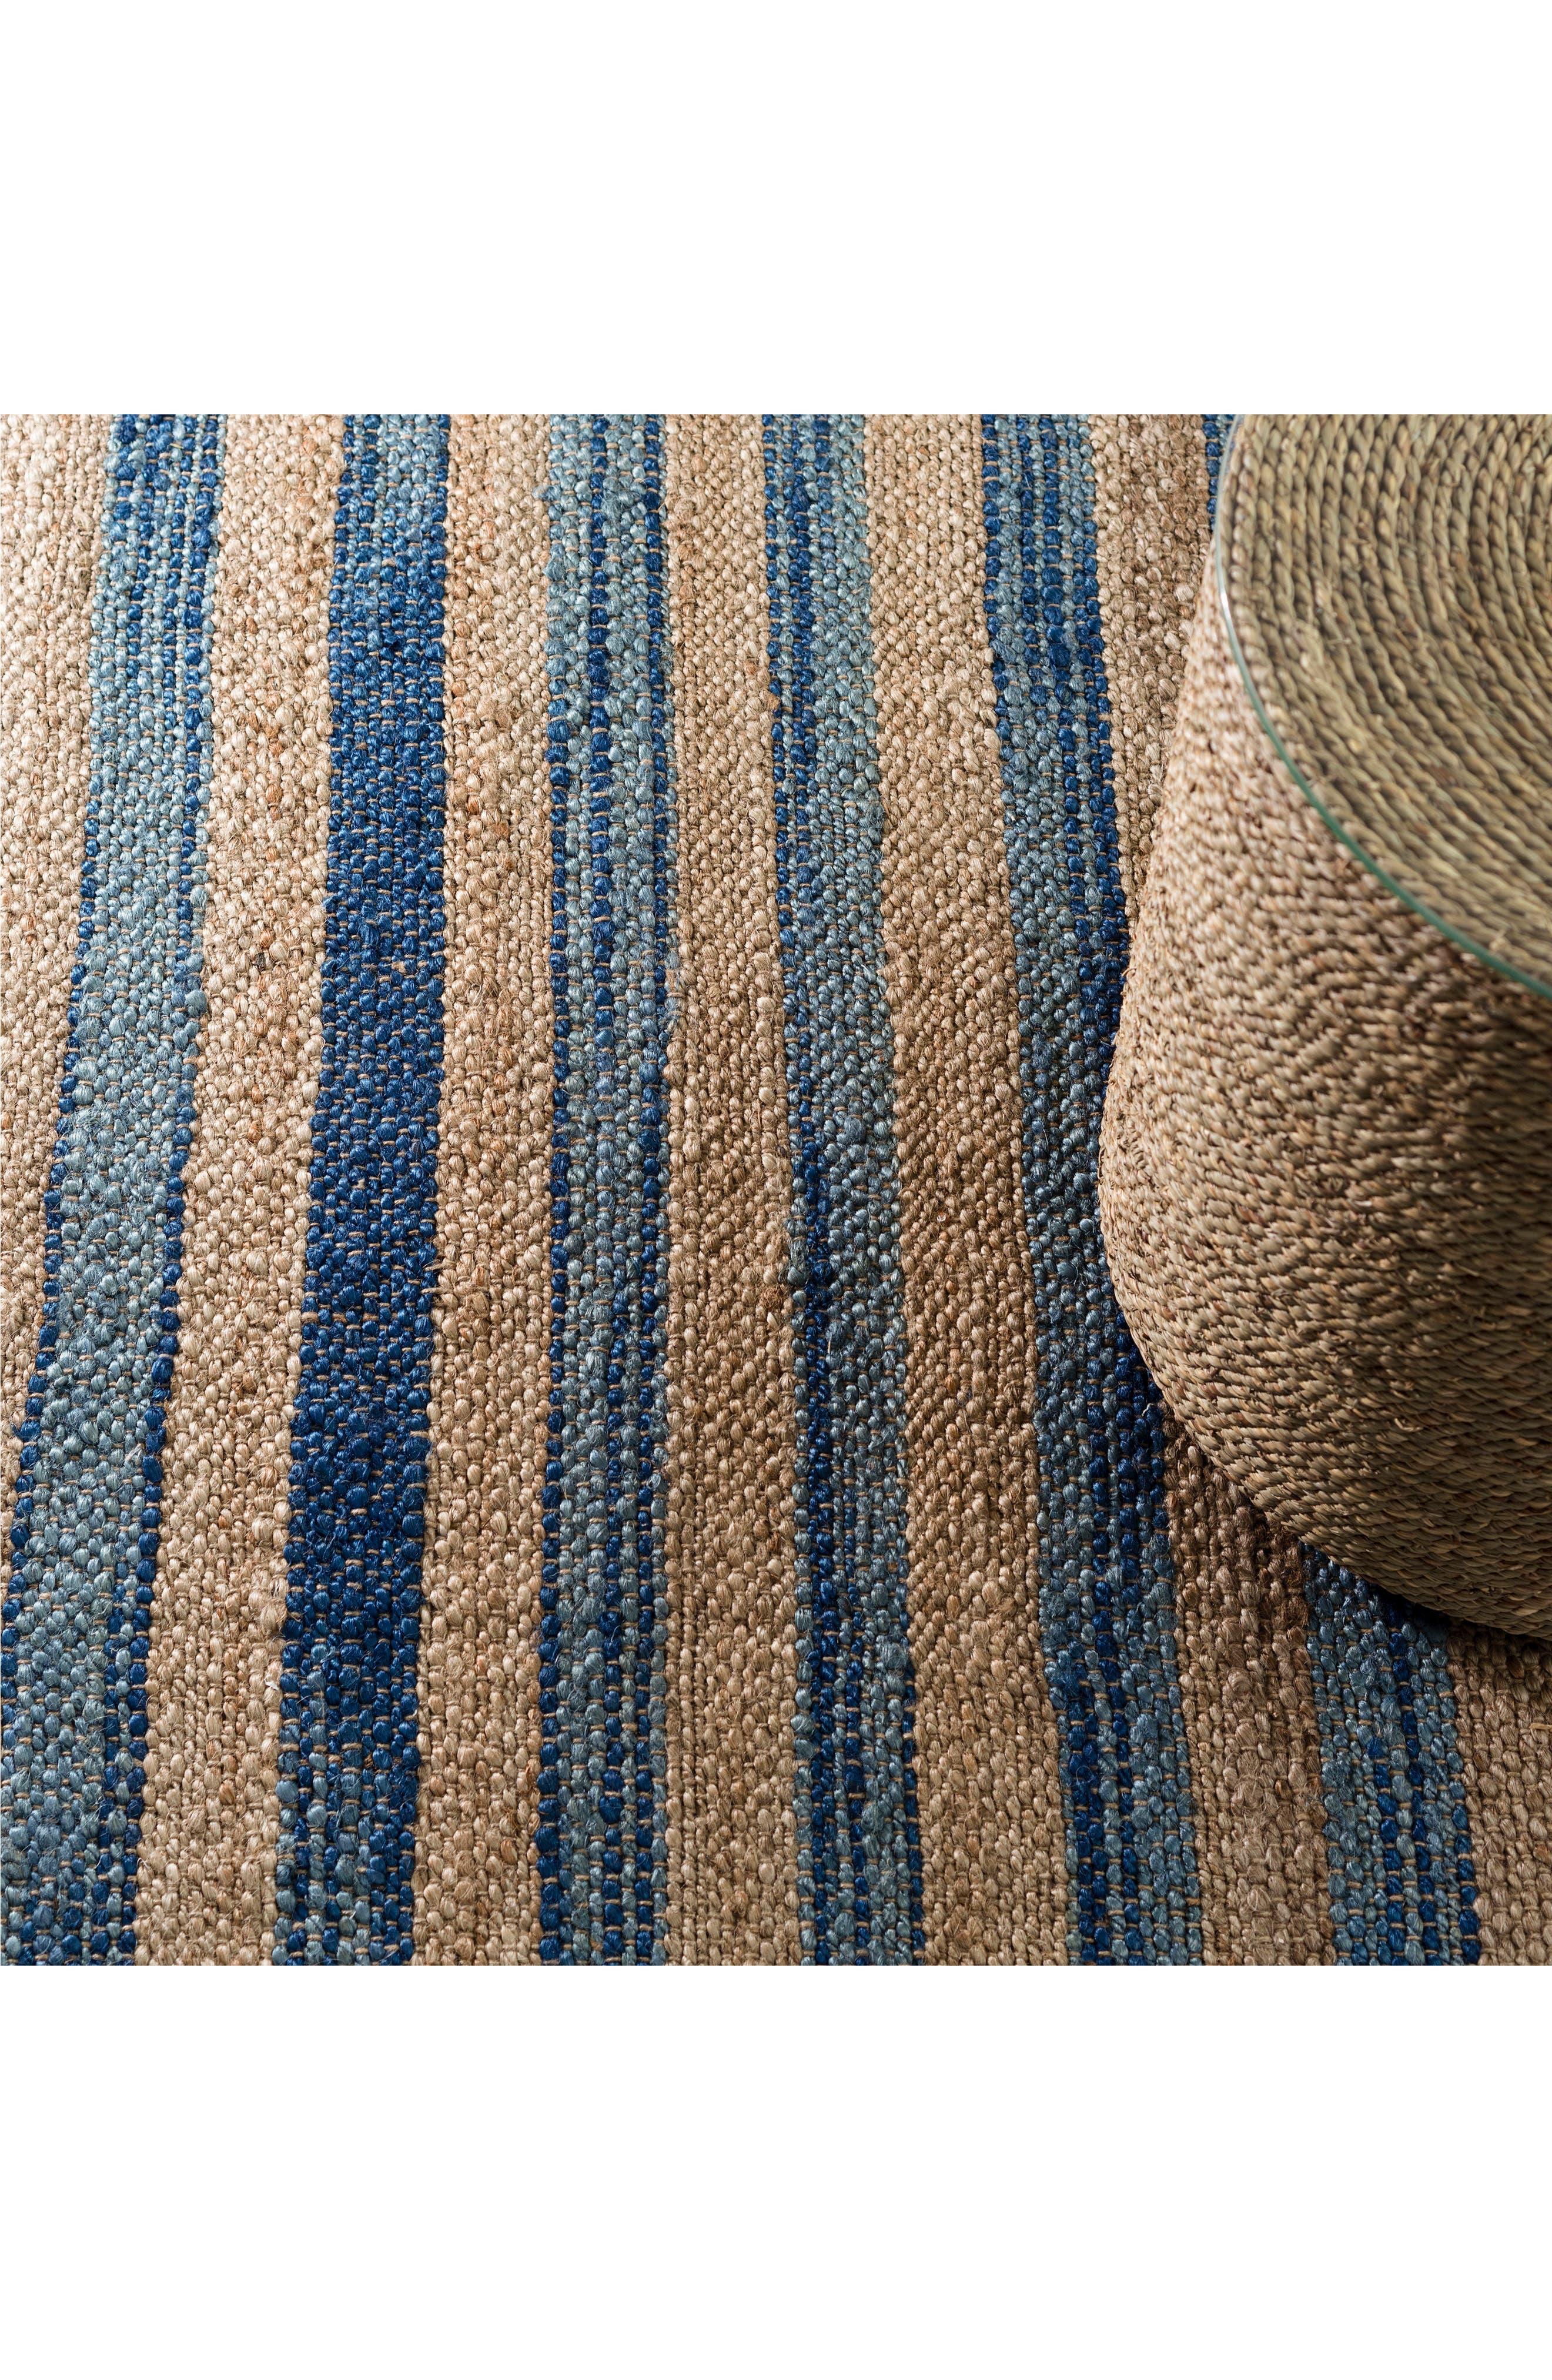 Corfu Woven Wool Rug,                             Alternate thumbnail 2, color,                             Blue